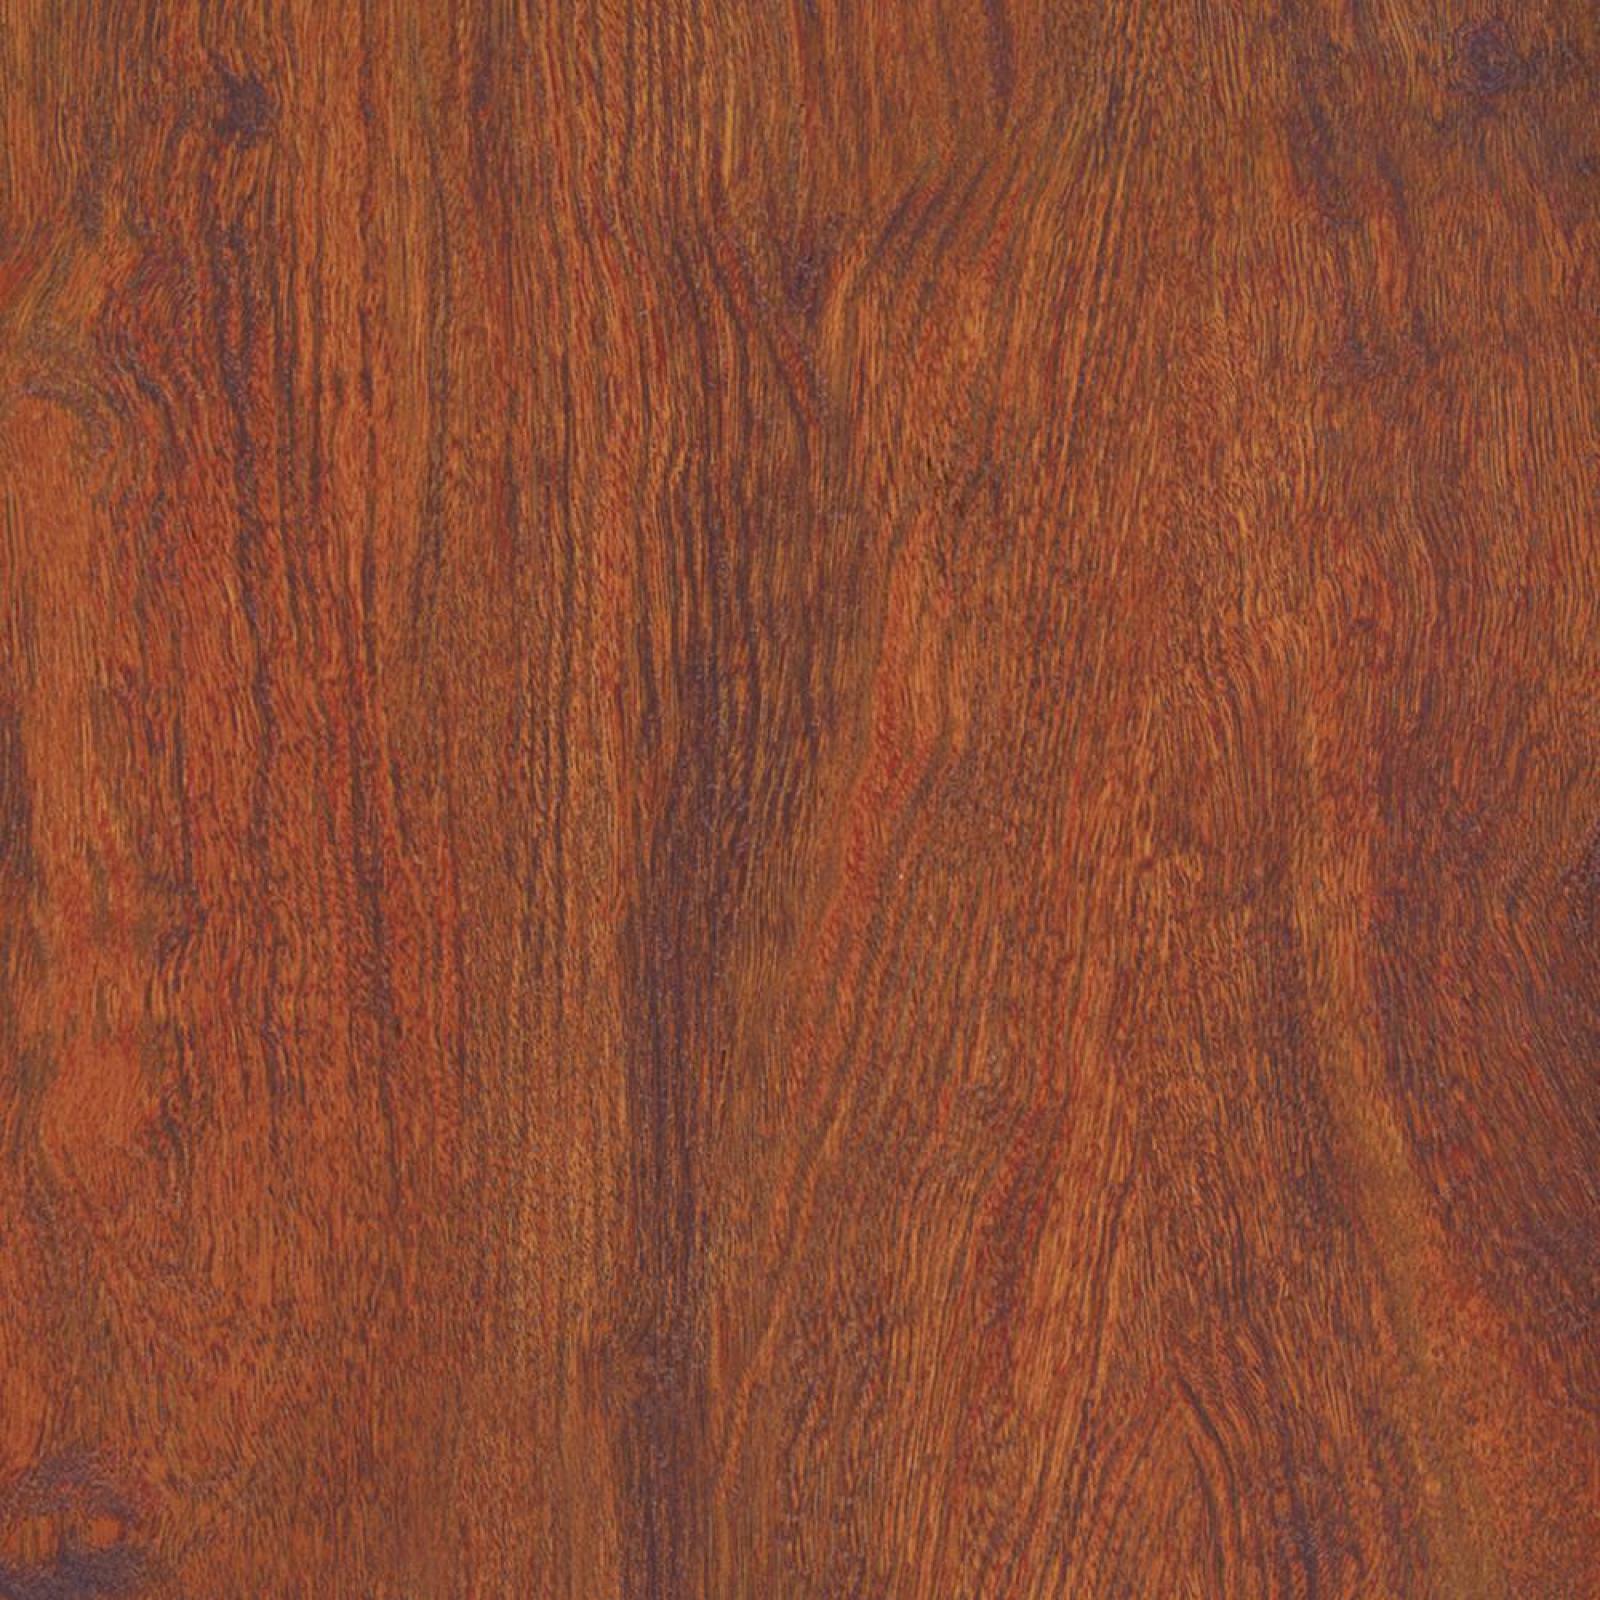 Details About Cherry Faux Wood Vinyl Plank Flooring Floor Water Scratch Resistant 24 Sq Ft